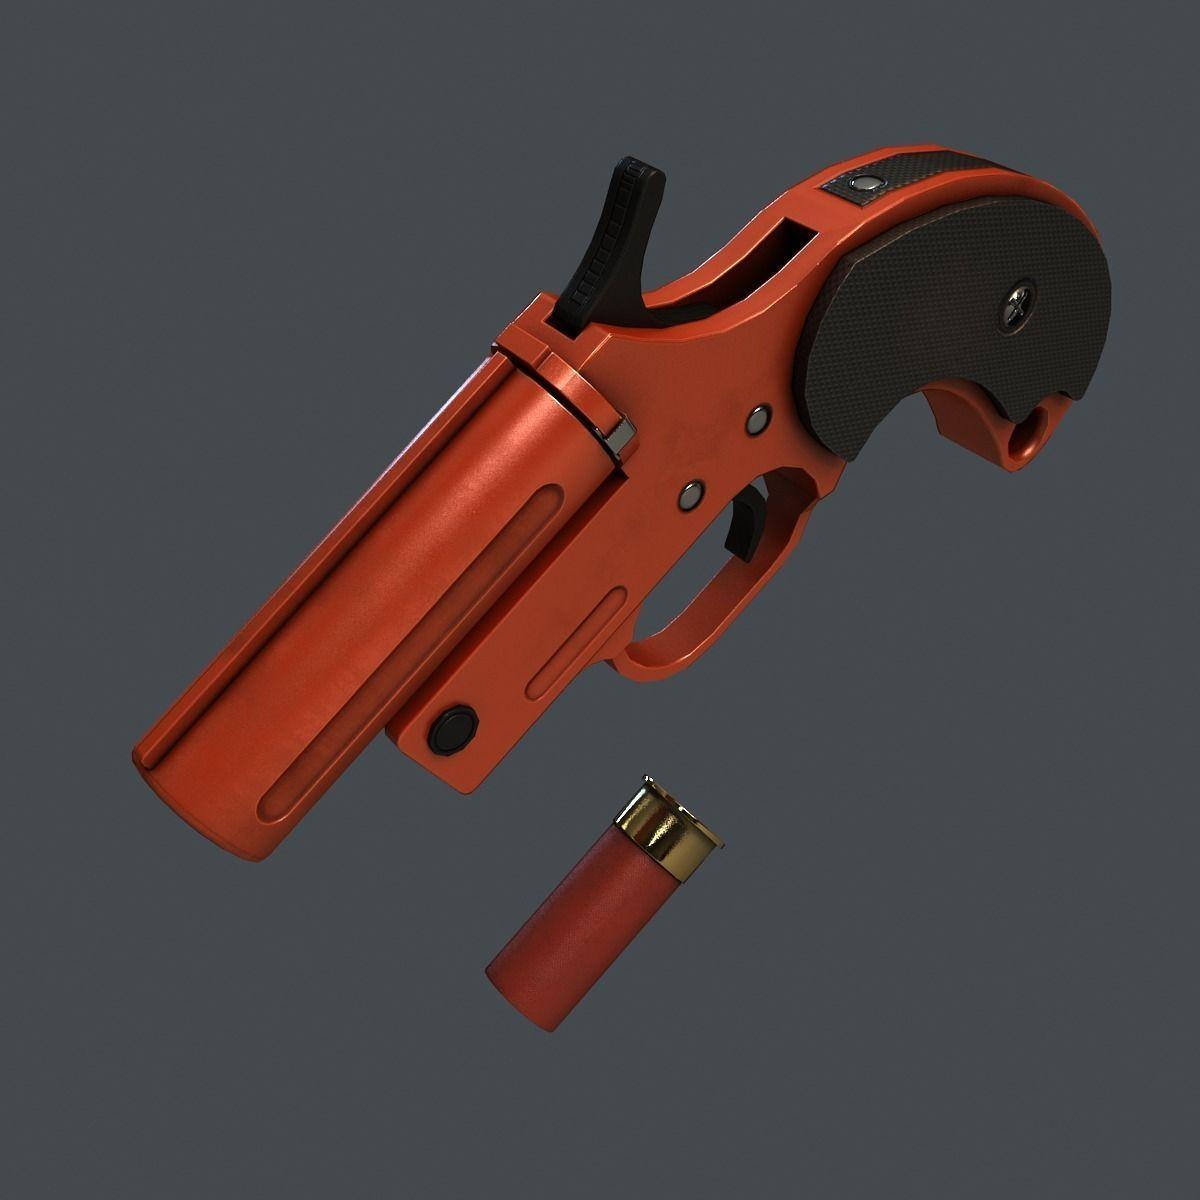 3d Gun Image 3d Home Architect: 3D Model Flare Gun VR / AR / Low-poly MAX OBJ FBX